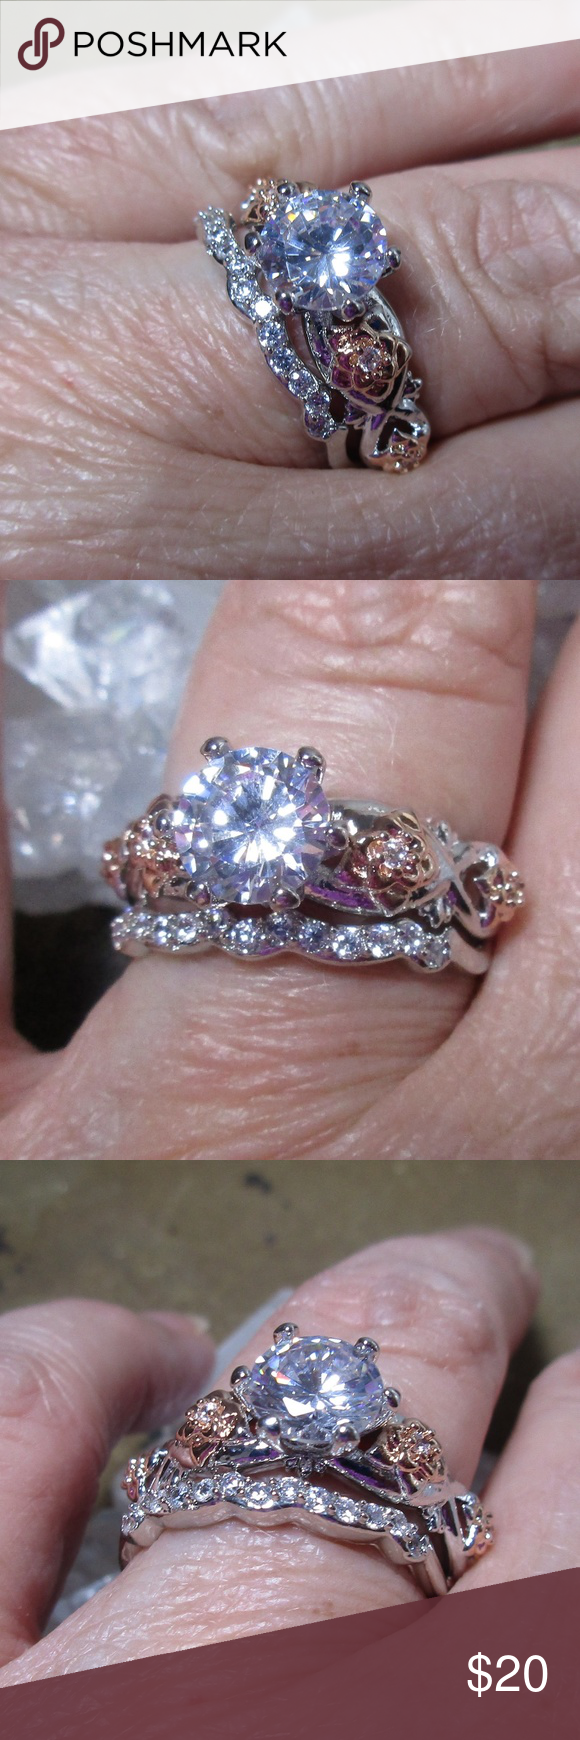 White & rose gold plated wedding ring set Sz 79 Wedding